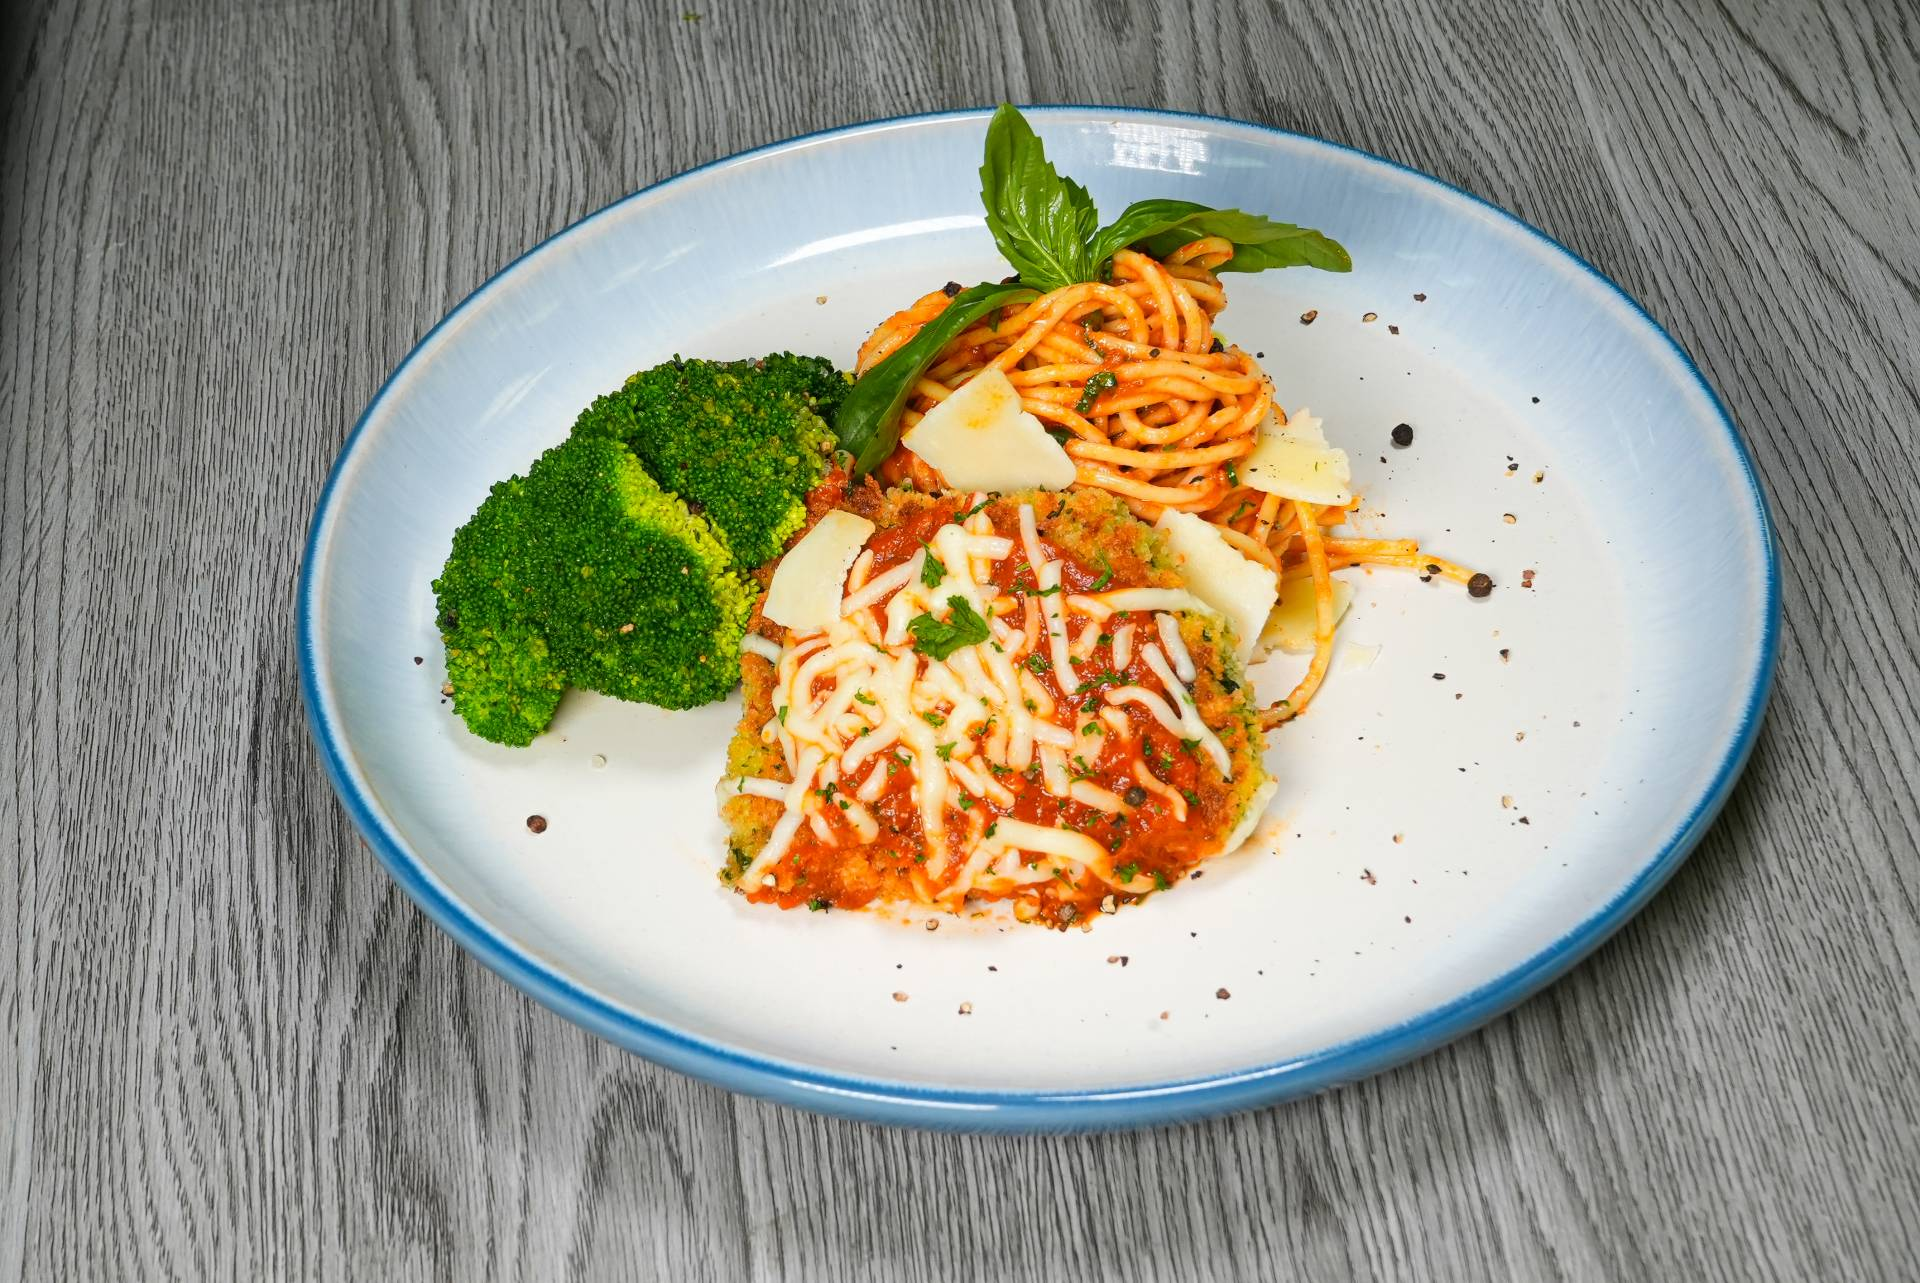 *NEW* Veal Parmesan